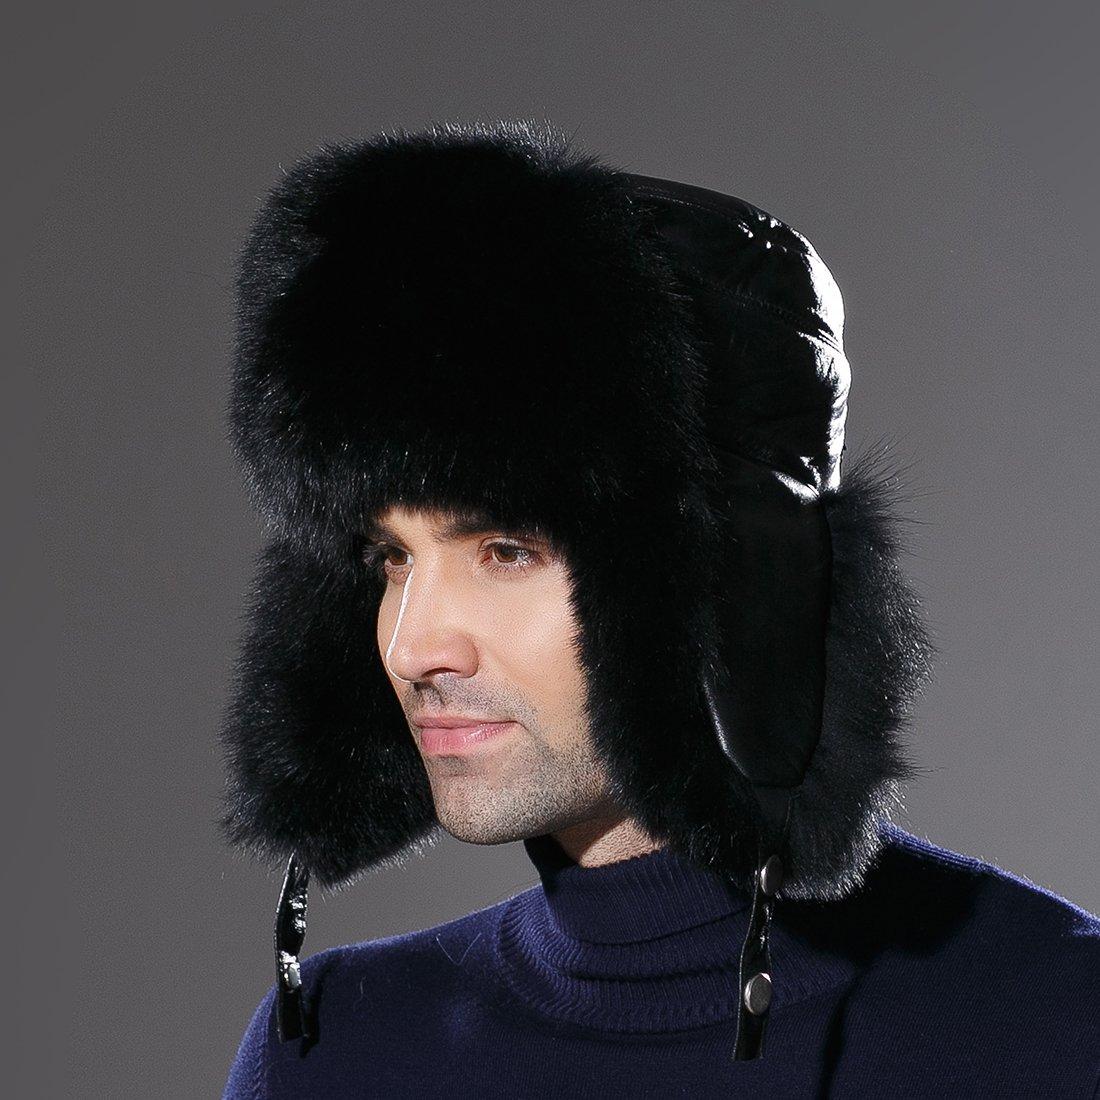 URSFUR Winter Russian Fur Hat Mens Real Fox Fur Ushanka Trapper Cap Black by URSFUR (Image #7)